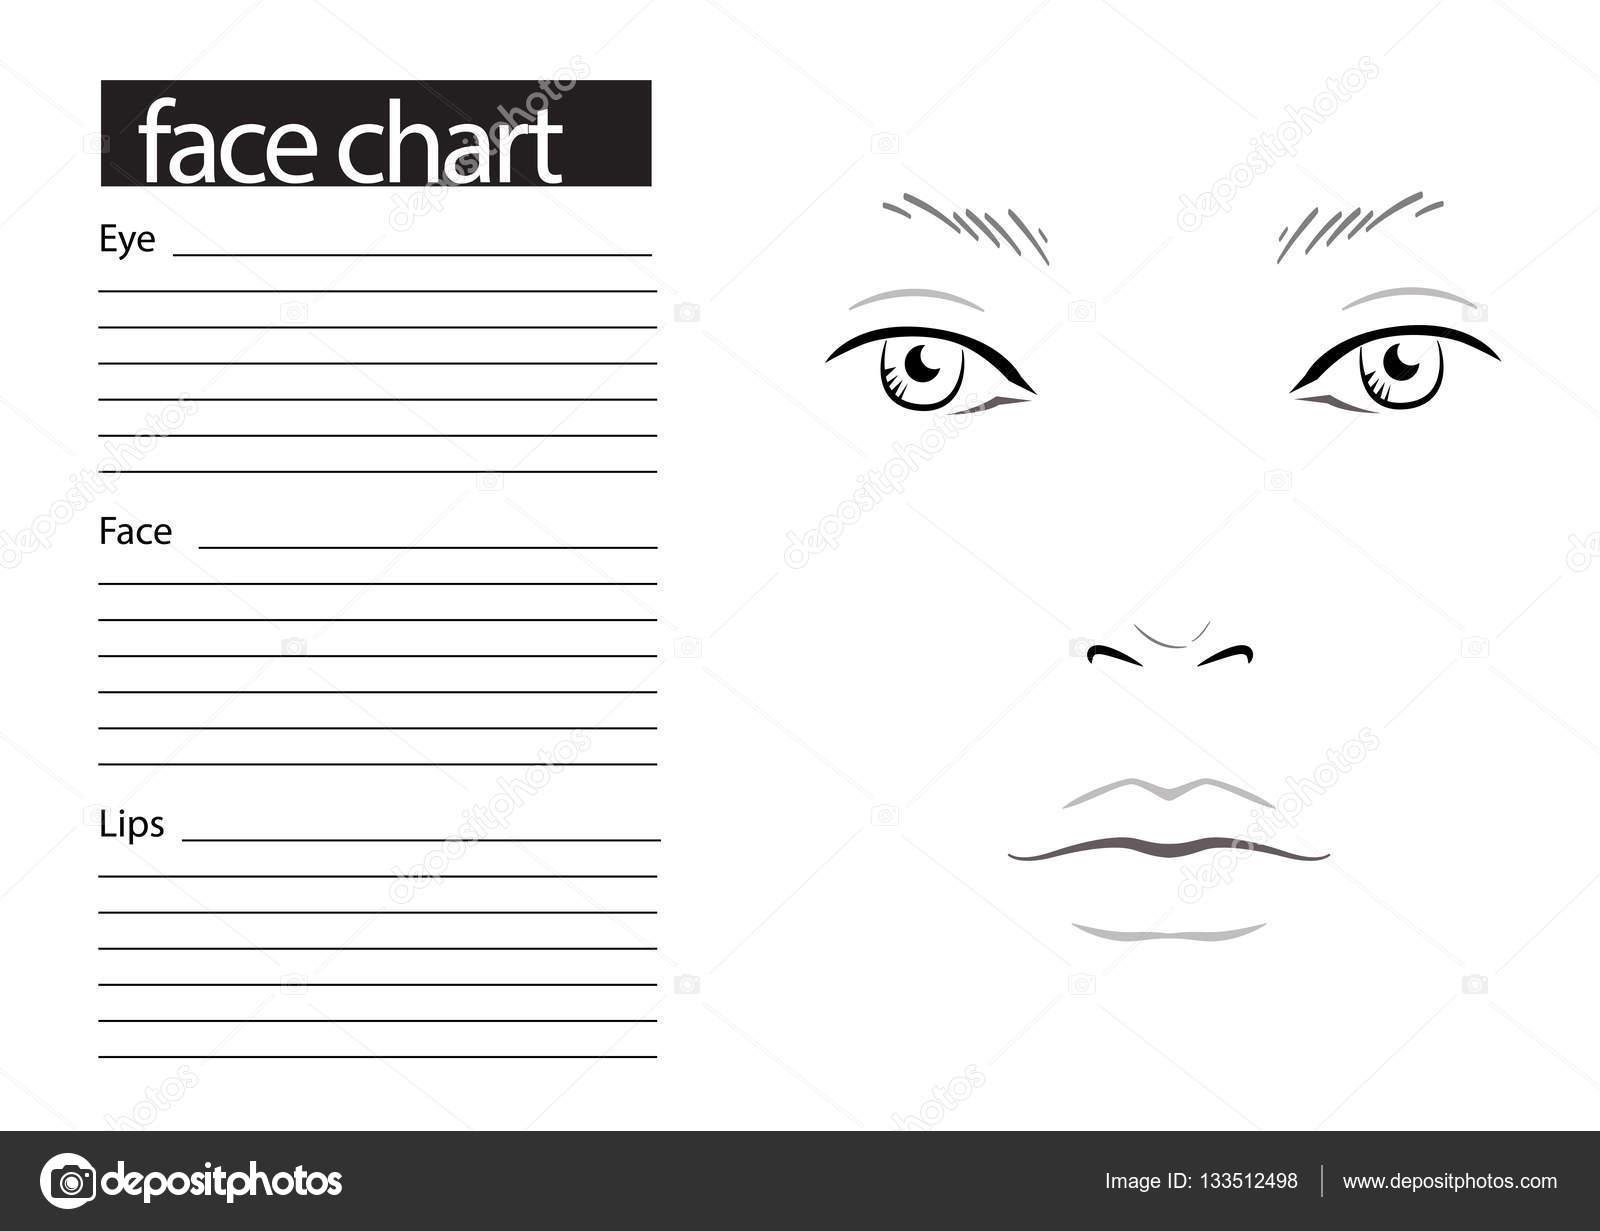 Gesicht-Diagramm Make-up Artist leer. -Vorlage. Vektor-illustration ...